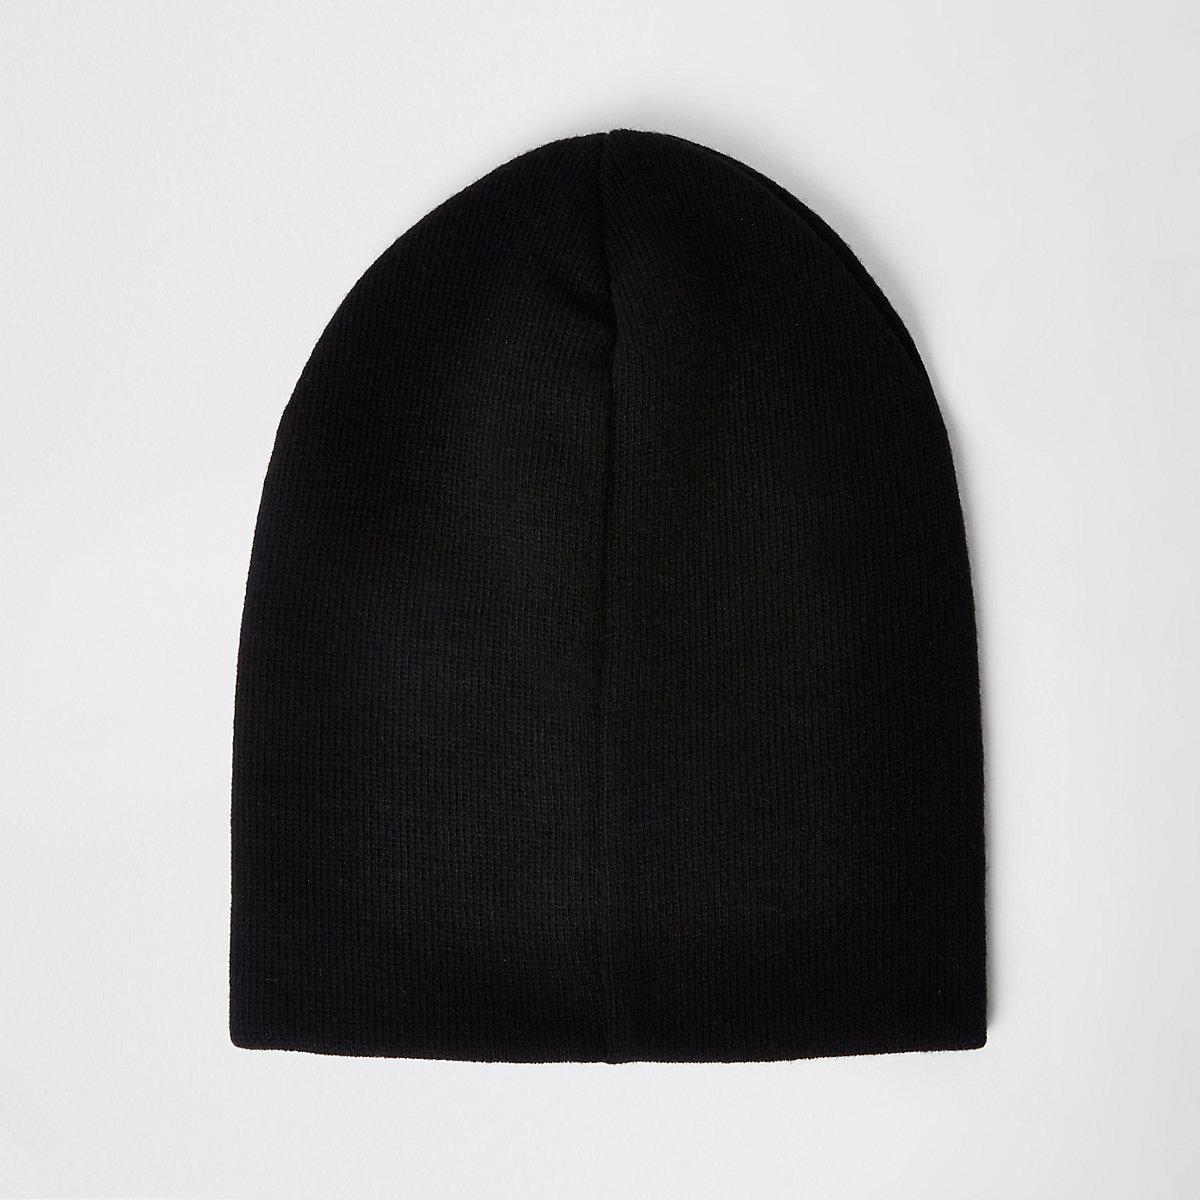 Black slouch beanie hat